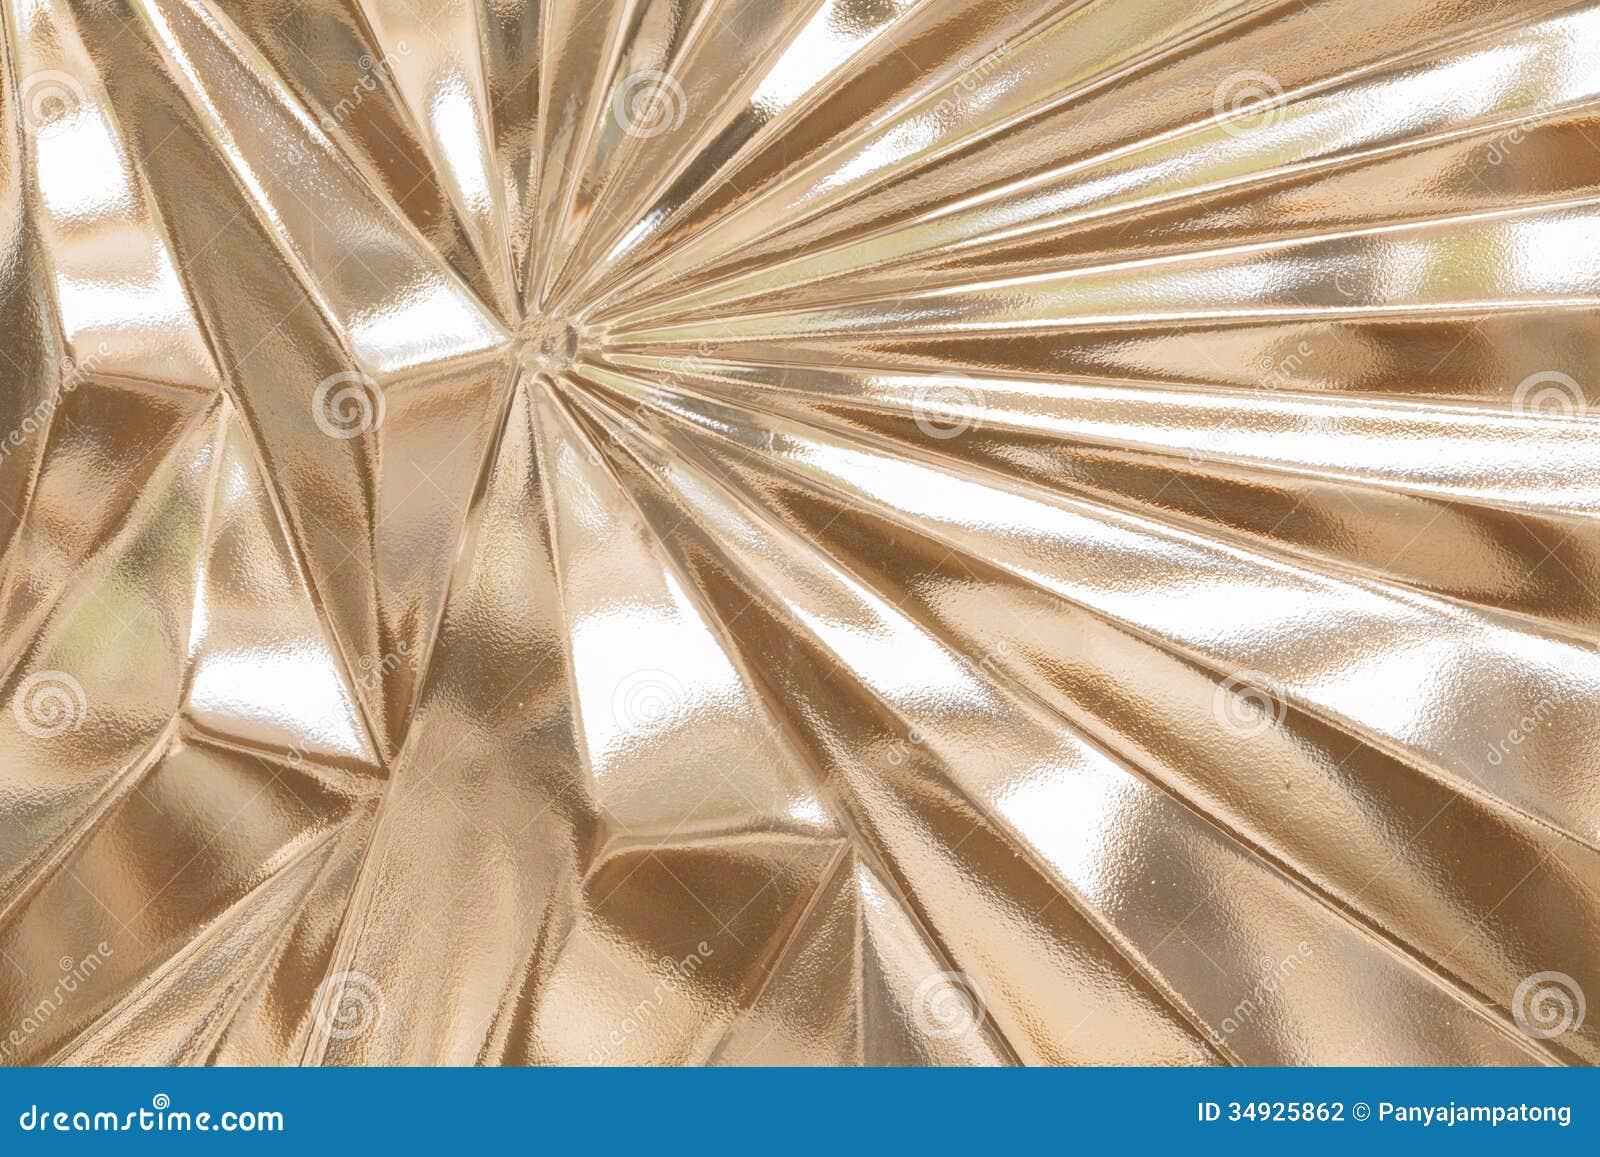 Textura Transparente De La Pared De Cristal Foto De